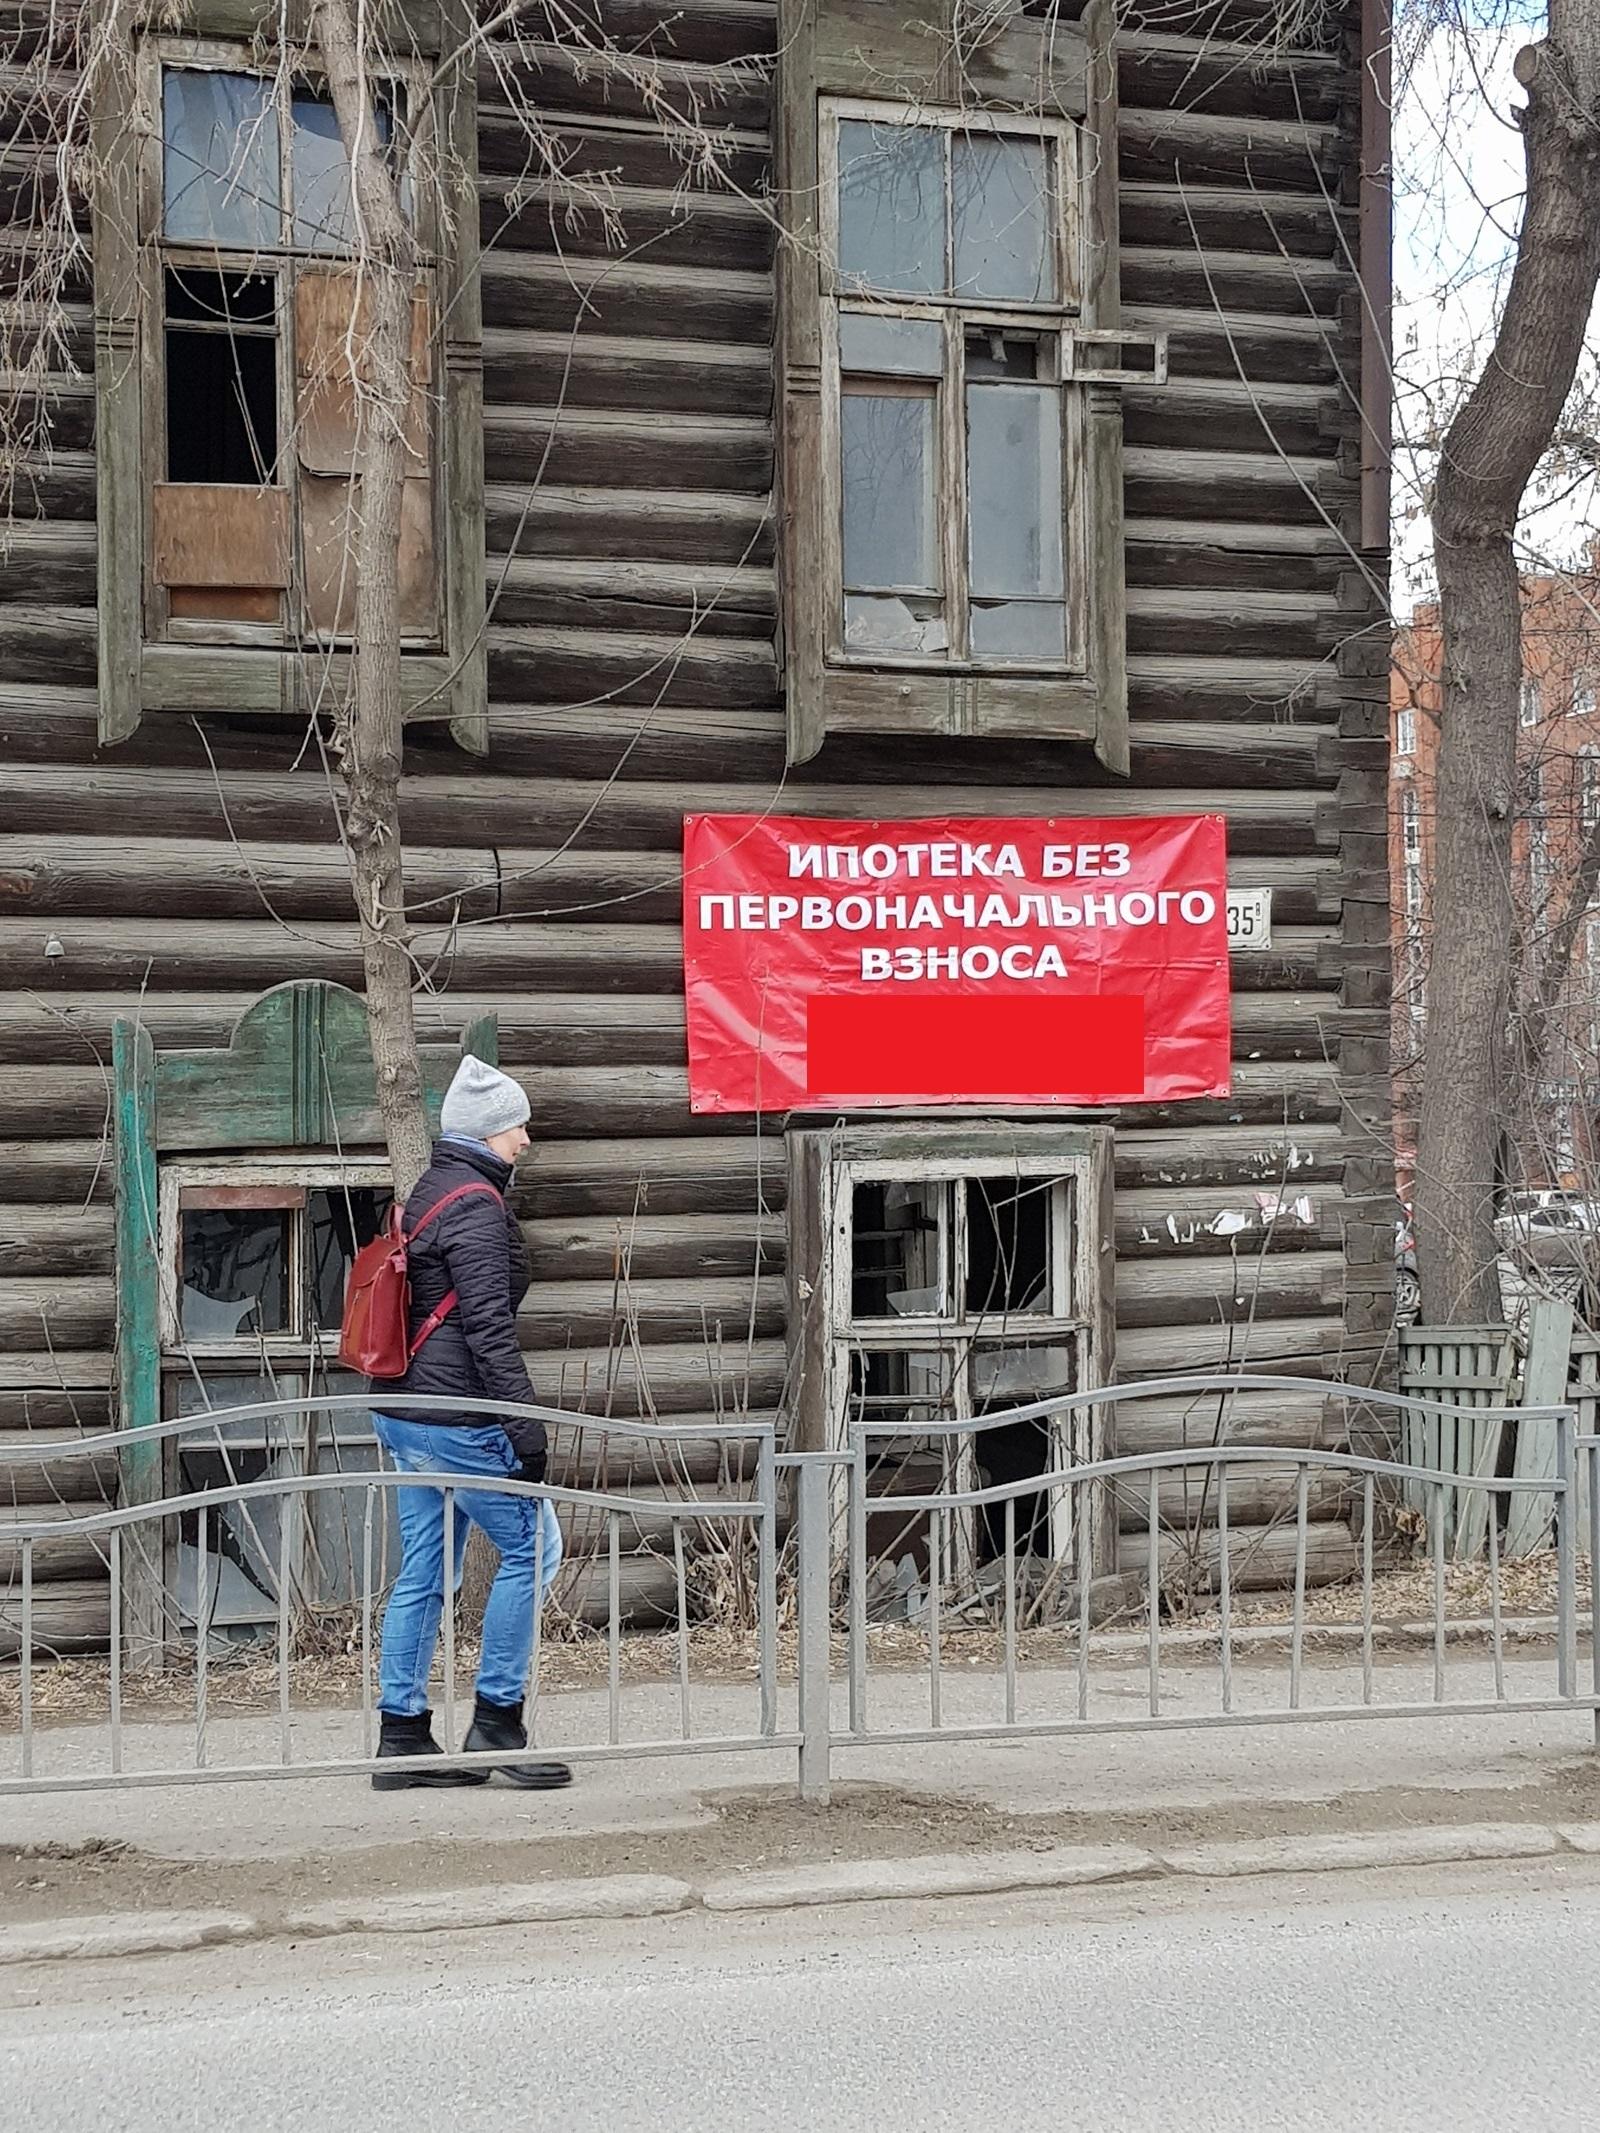 Реклама ипотеки без первоначального взноса